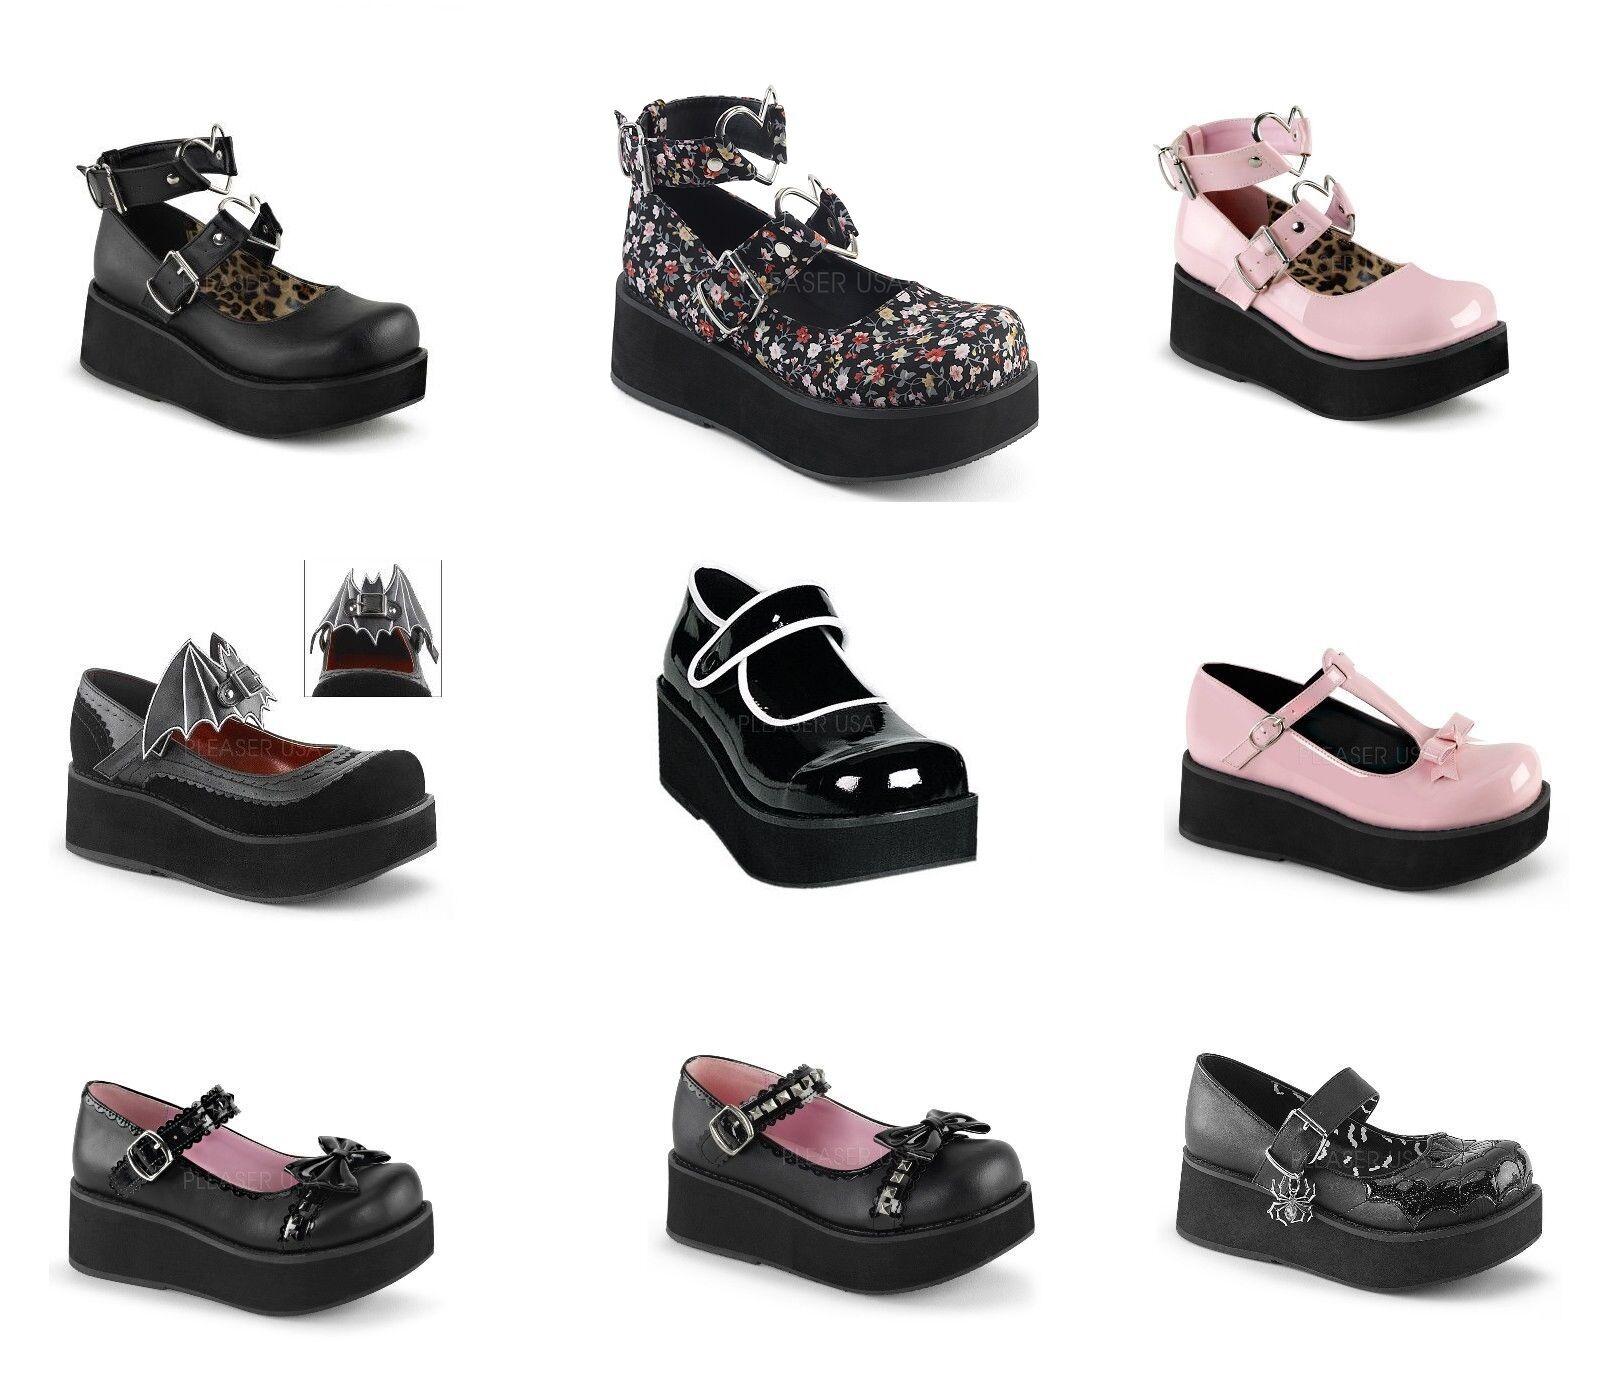 Demonia Women's SPRITE-01 02 03 04 05 09 Platform shoes